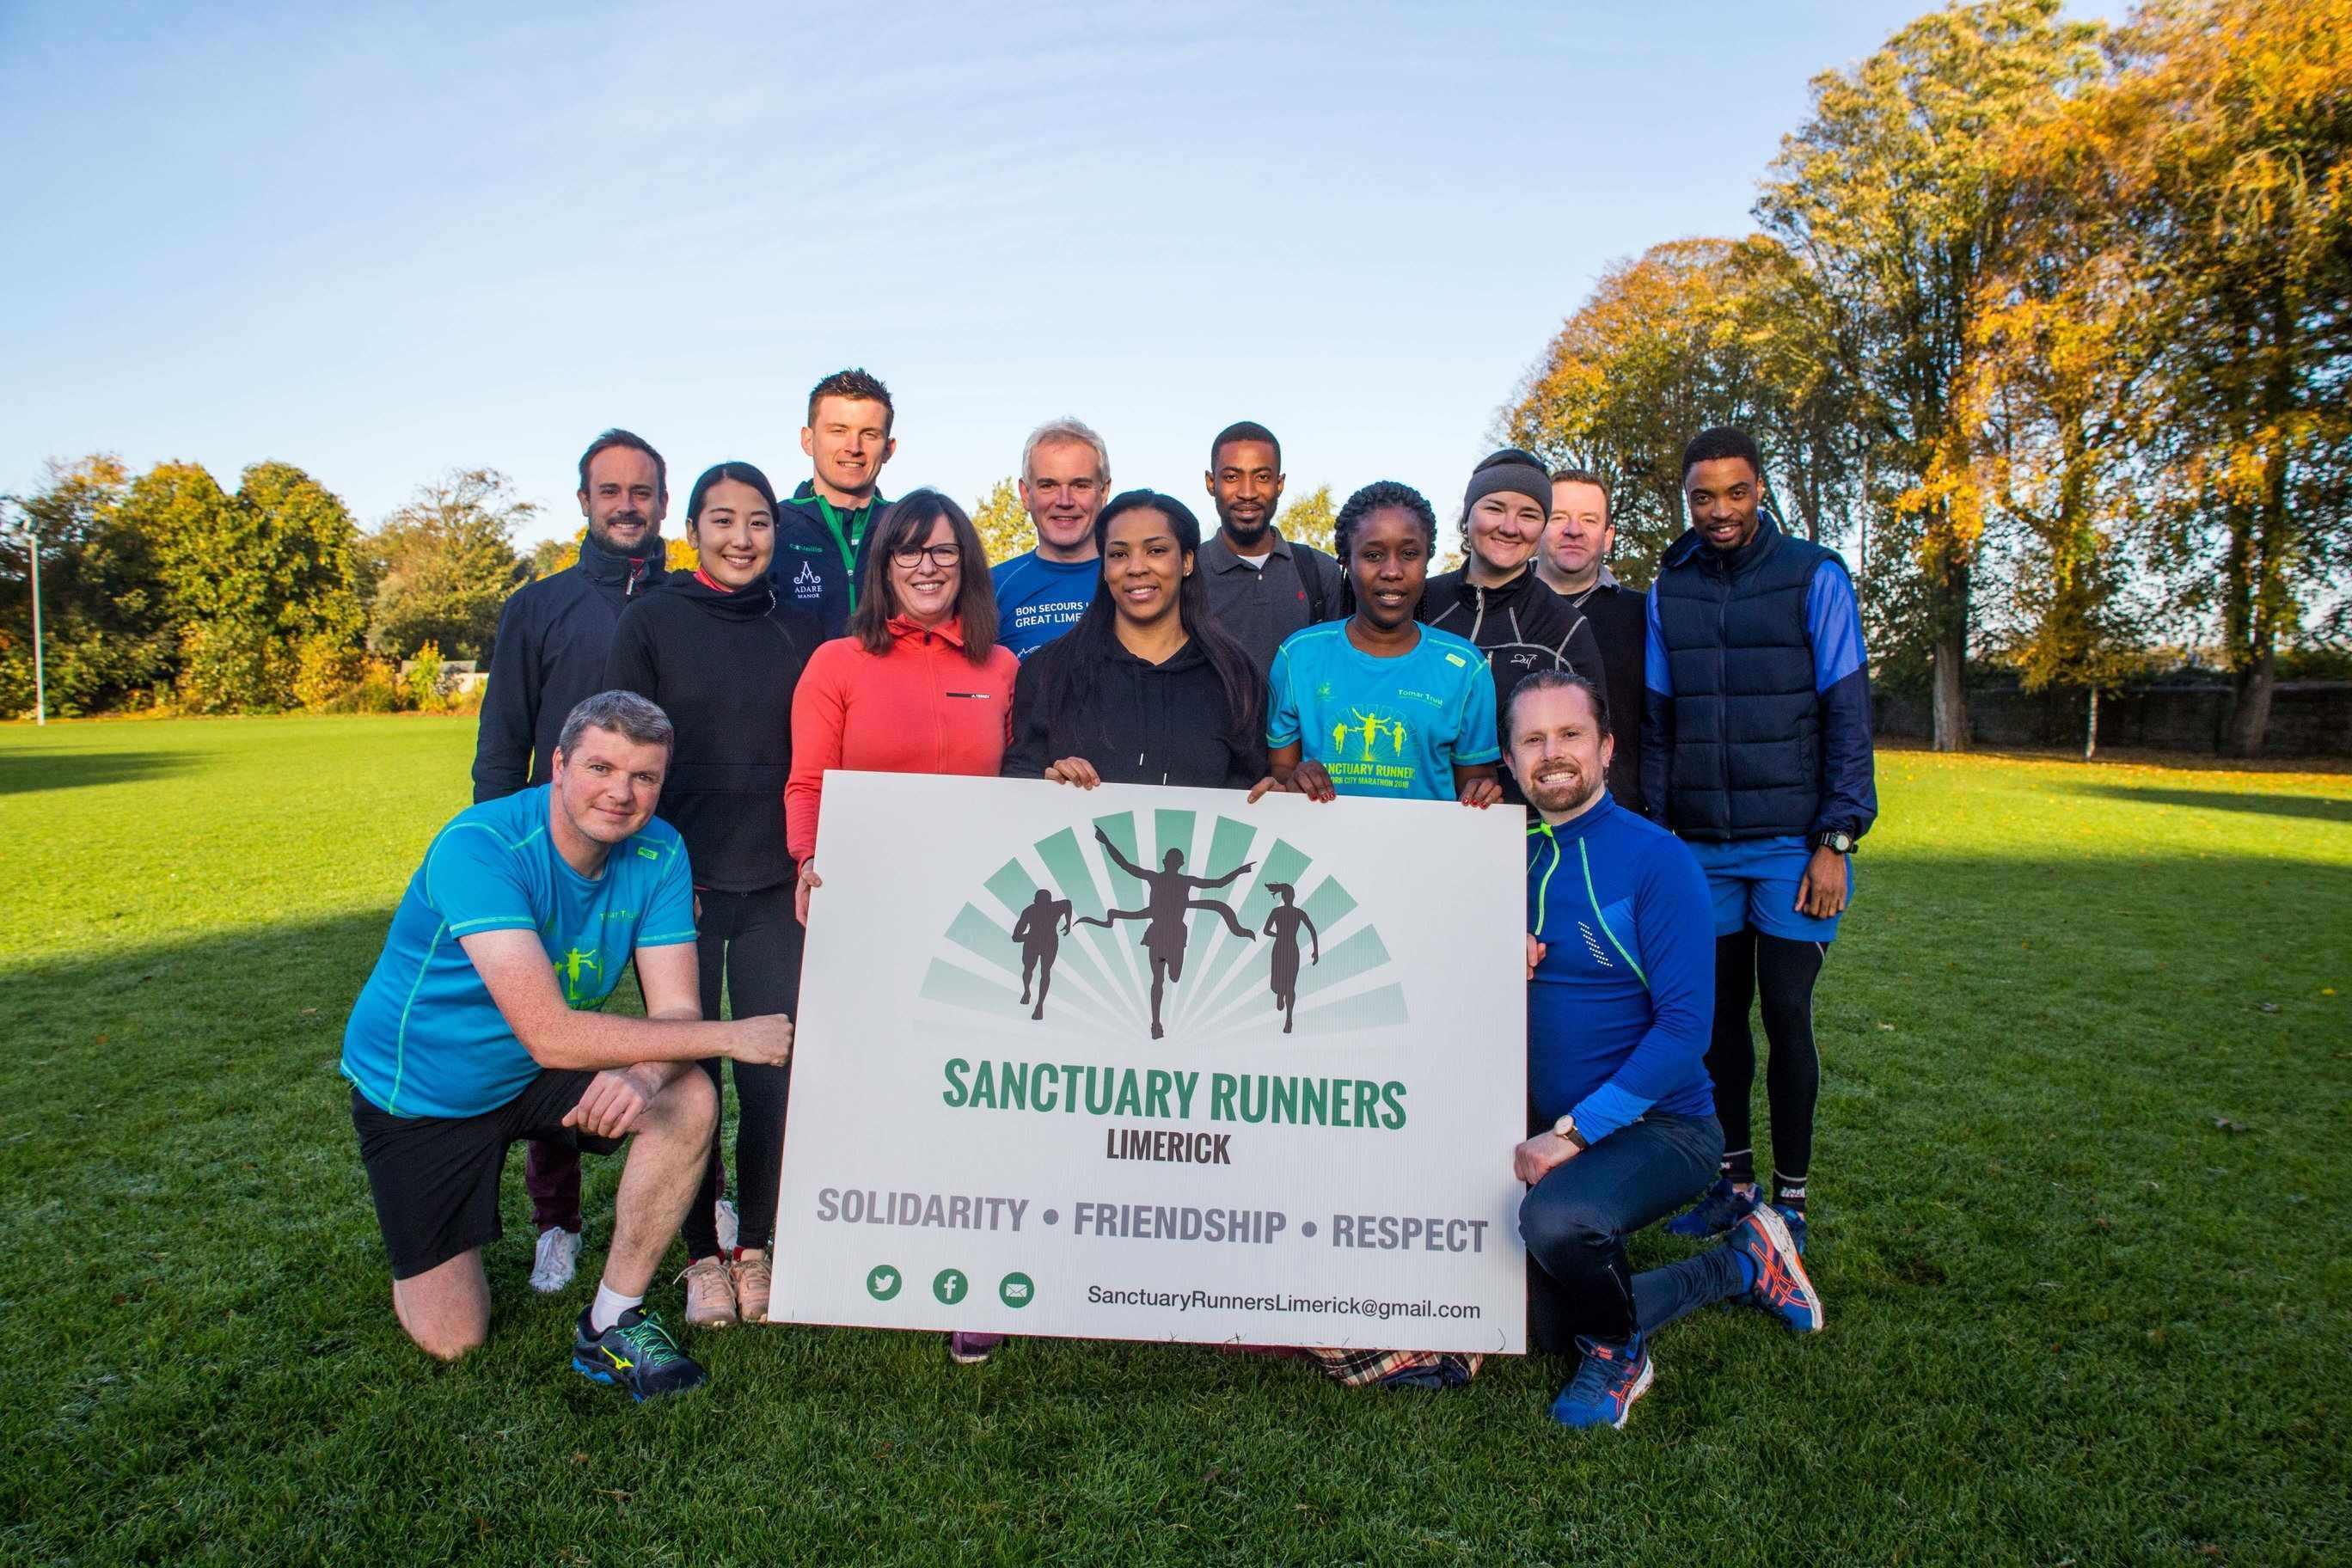 Sanctuary Runners Limerick